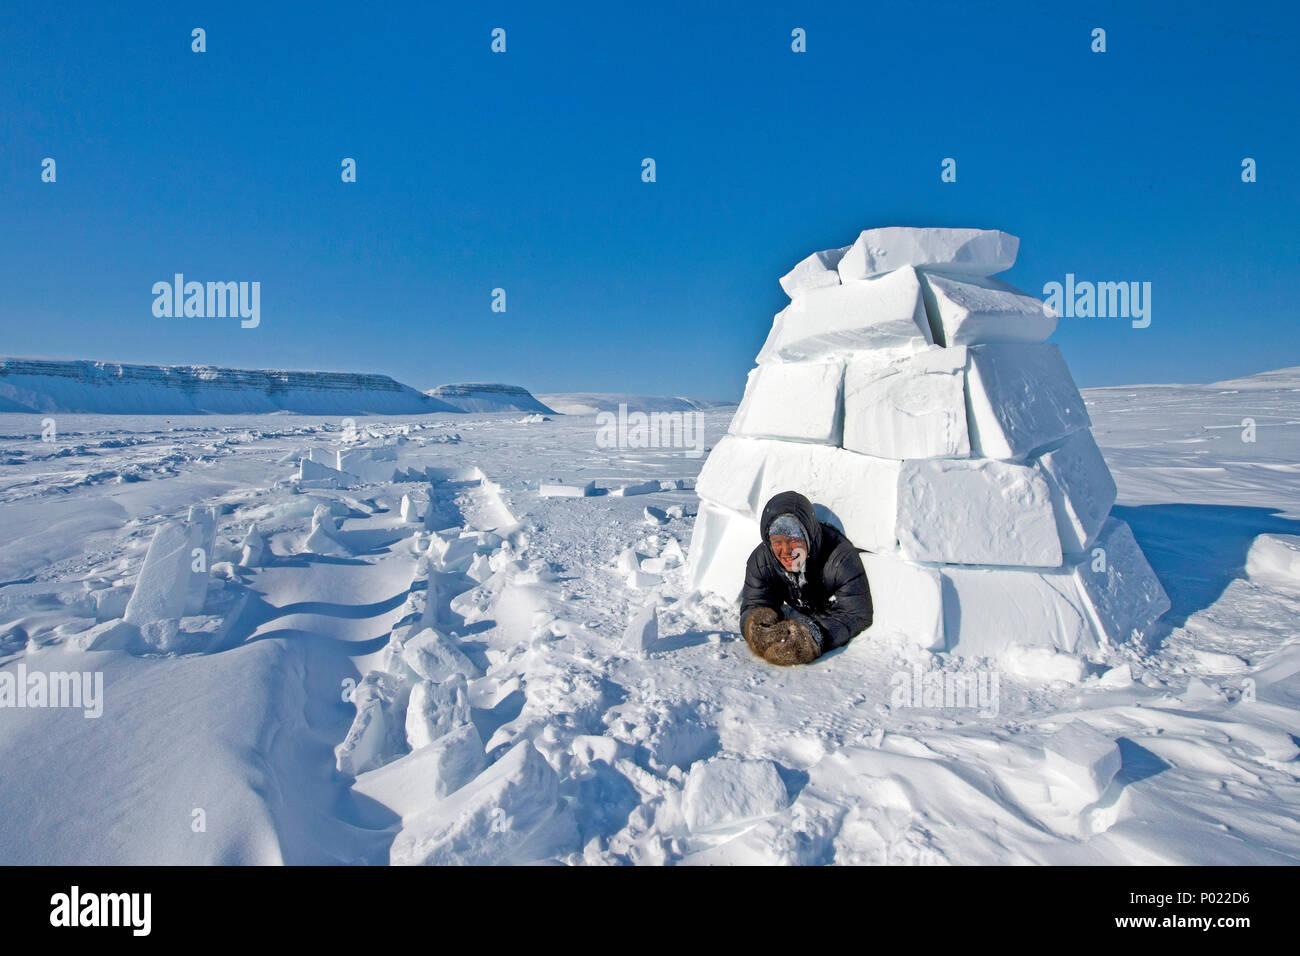 Inuit schaut aus einem Iglu, Nunavut Territorium, Kanada | Inuit looks out of a igloo, Nunavut teritorry, Canada - Stock Image